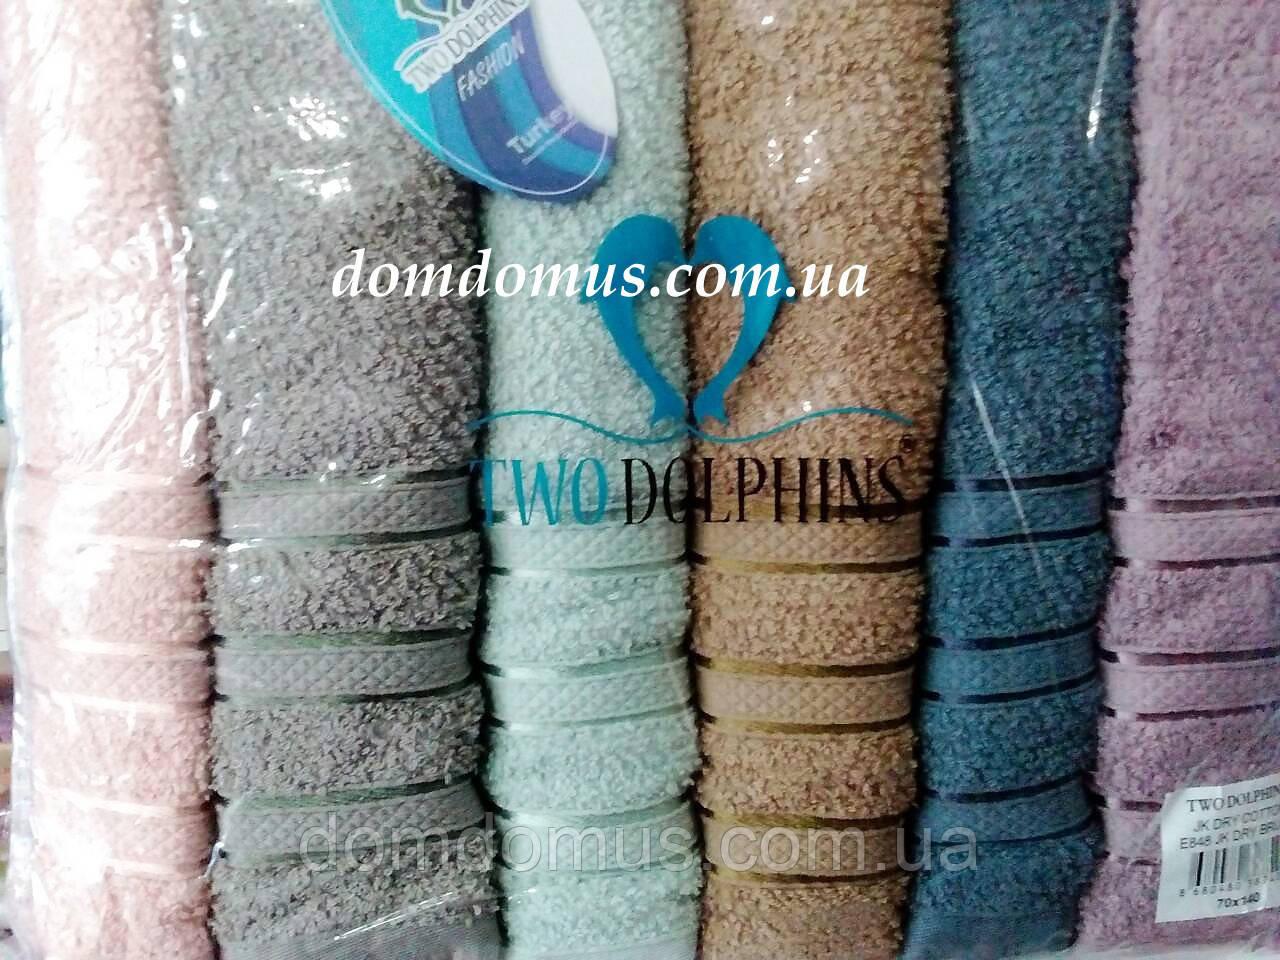 Набор полотенец  50*90 TWO DOLPHINS 6 шт./уп., Турция 848